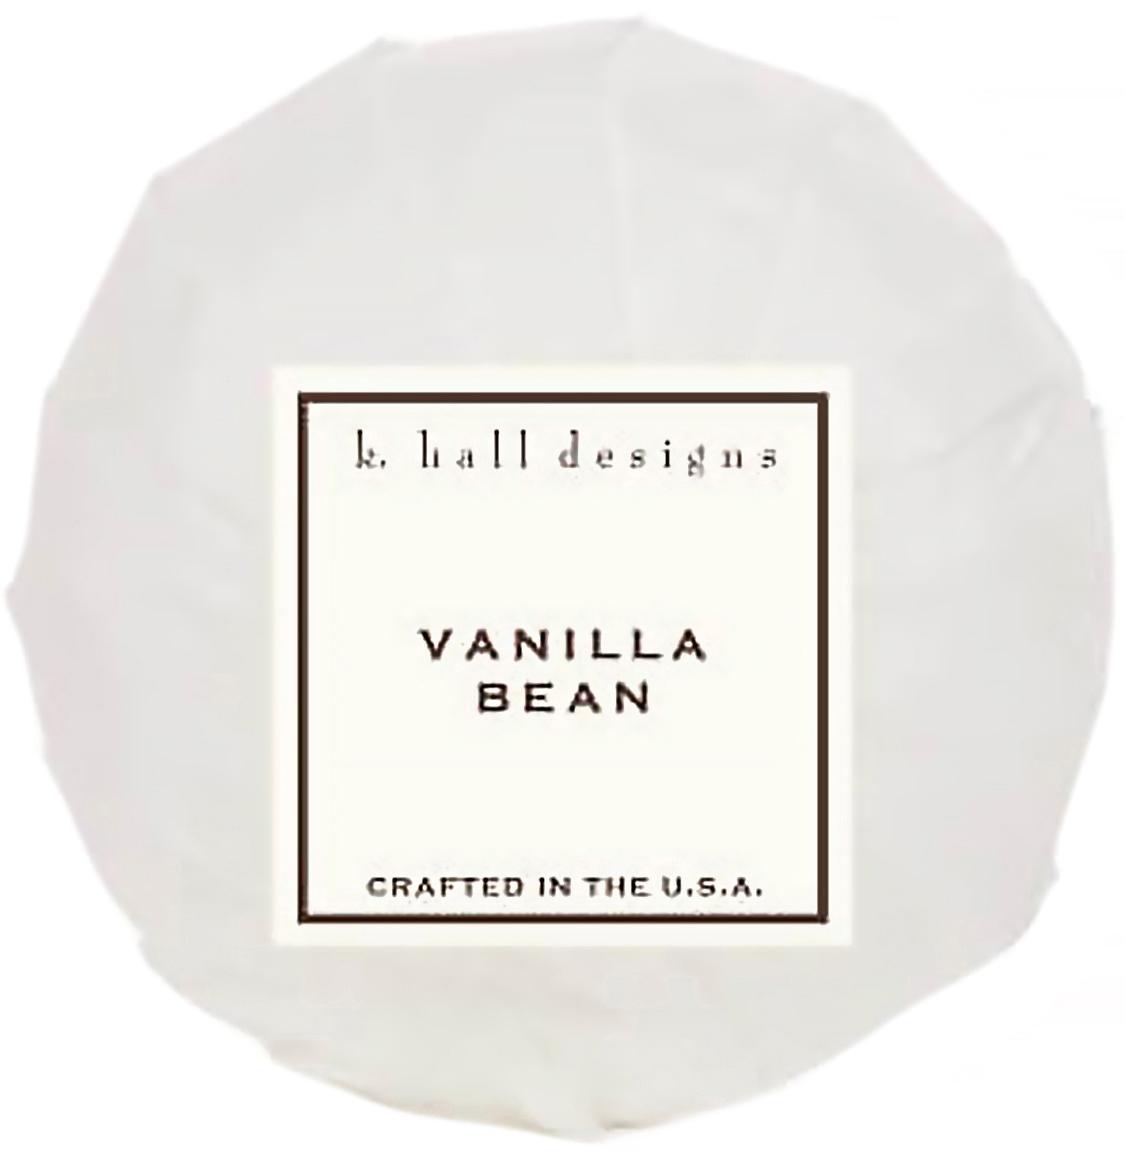 Badekugel Vanilla Bean (Vanille & Tonkabohne), Weiss, Ø 7 x H 7 cm